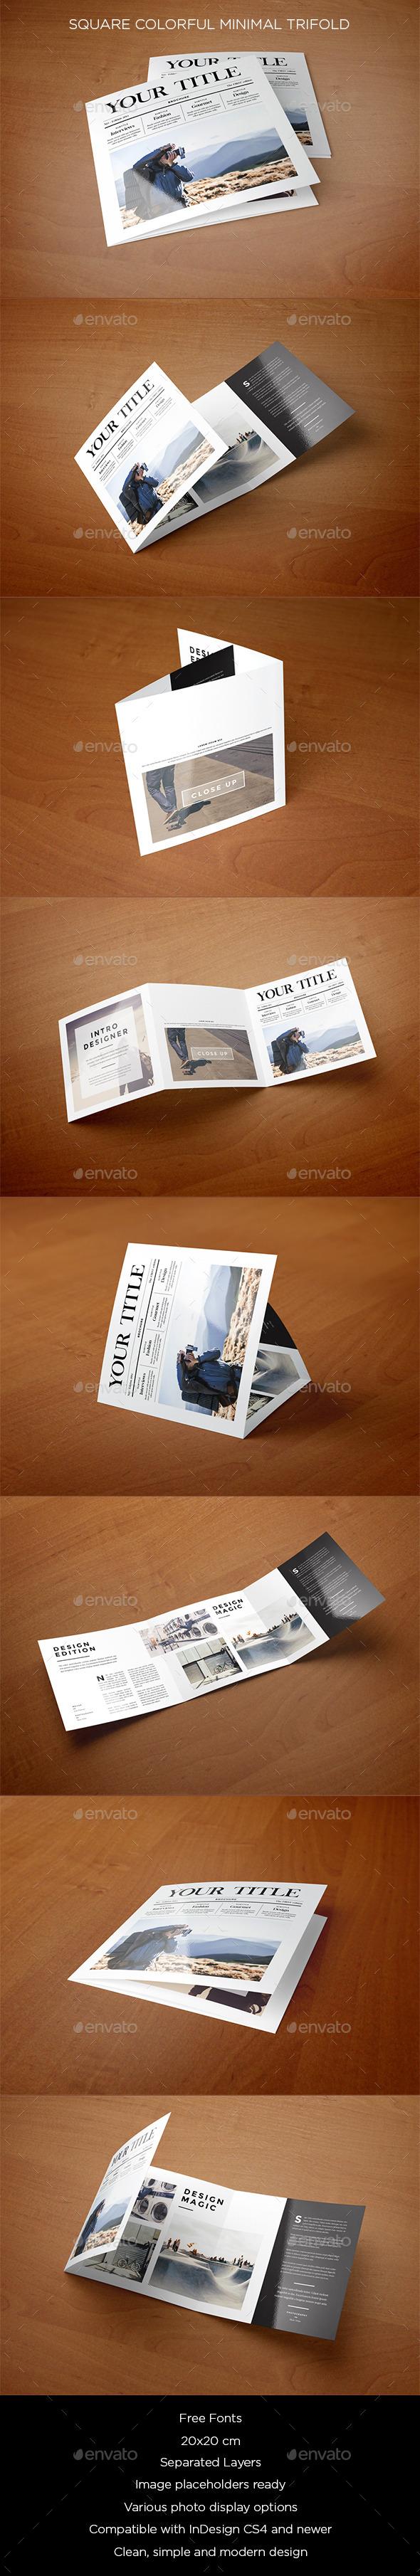 GraphicRiver Square Minimal Style Trifold 9132686